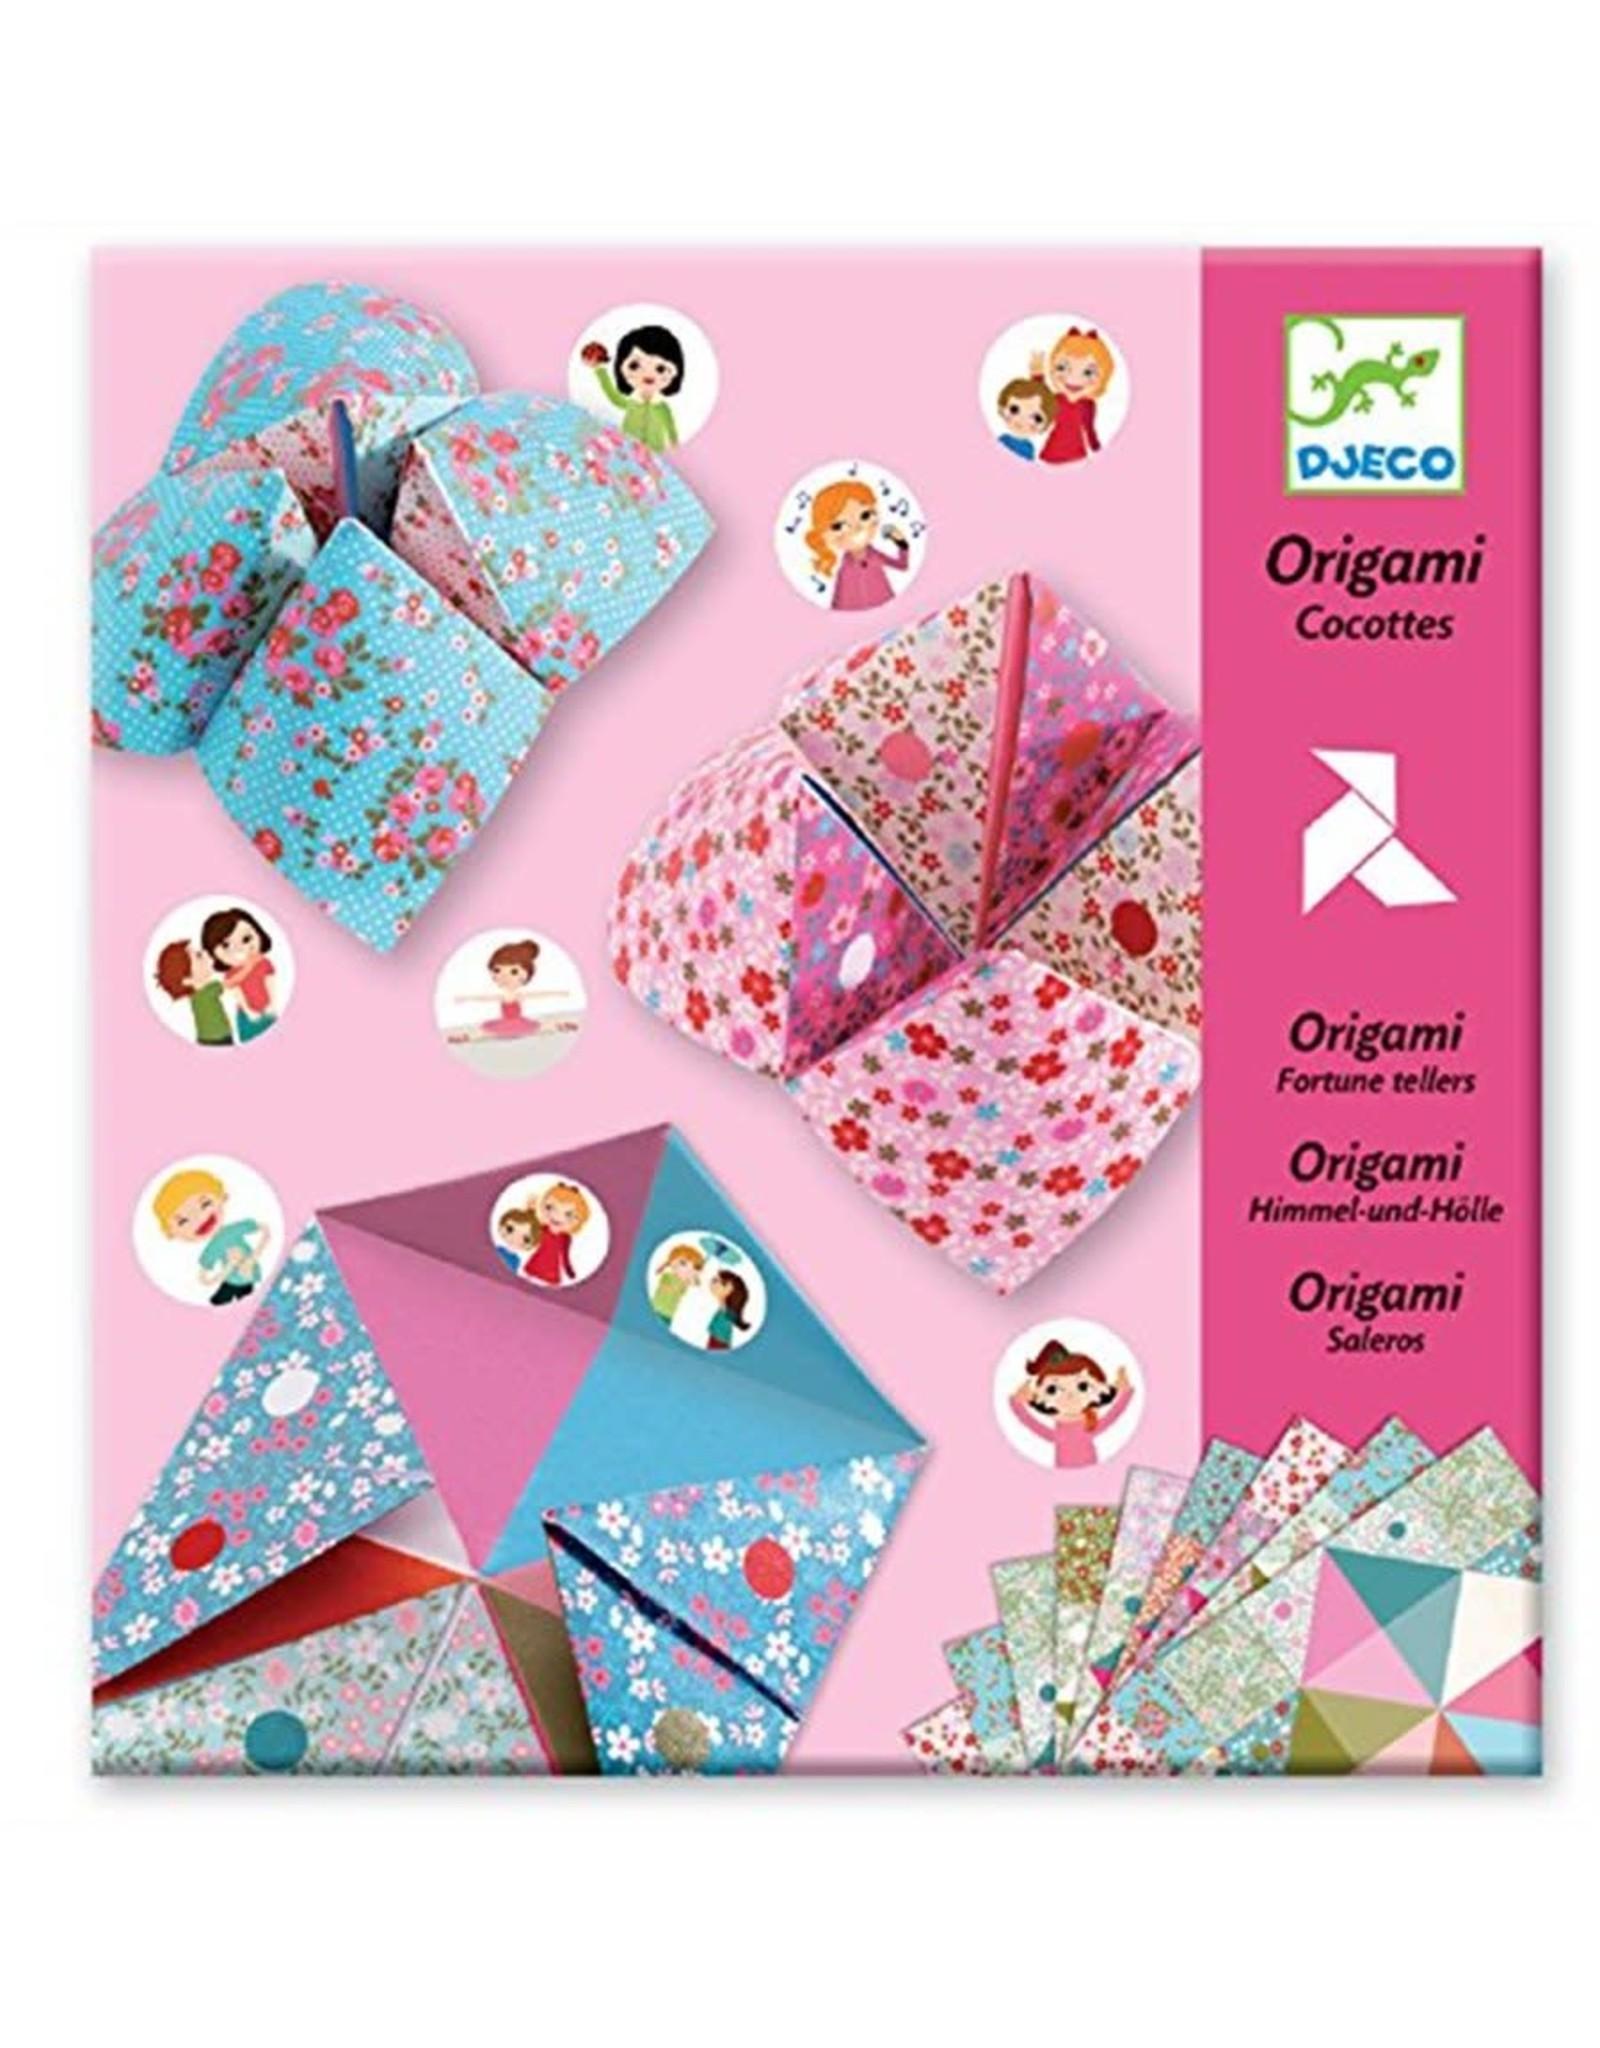 Djeco Origami, Fortune Tellers